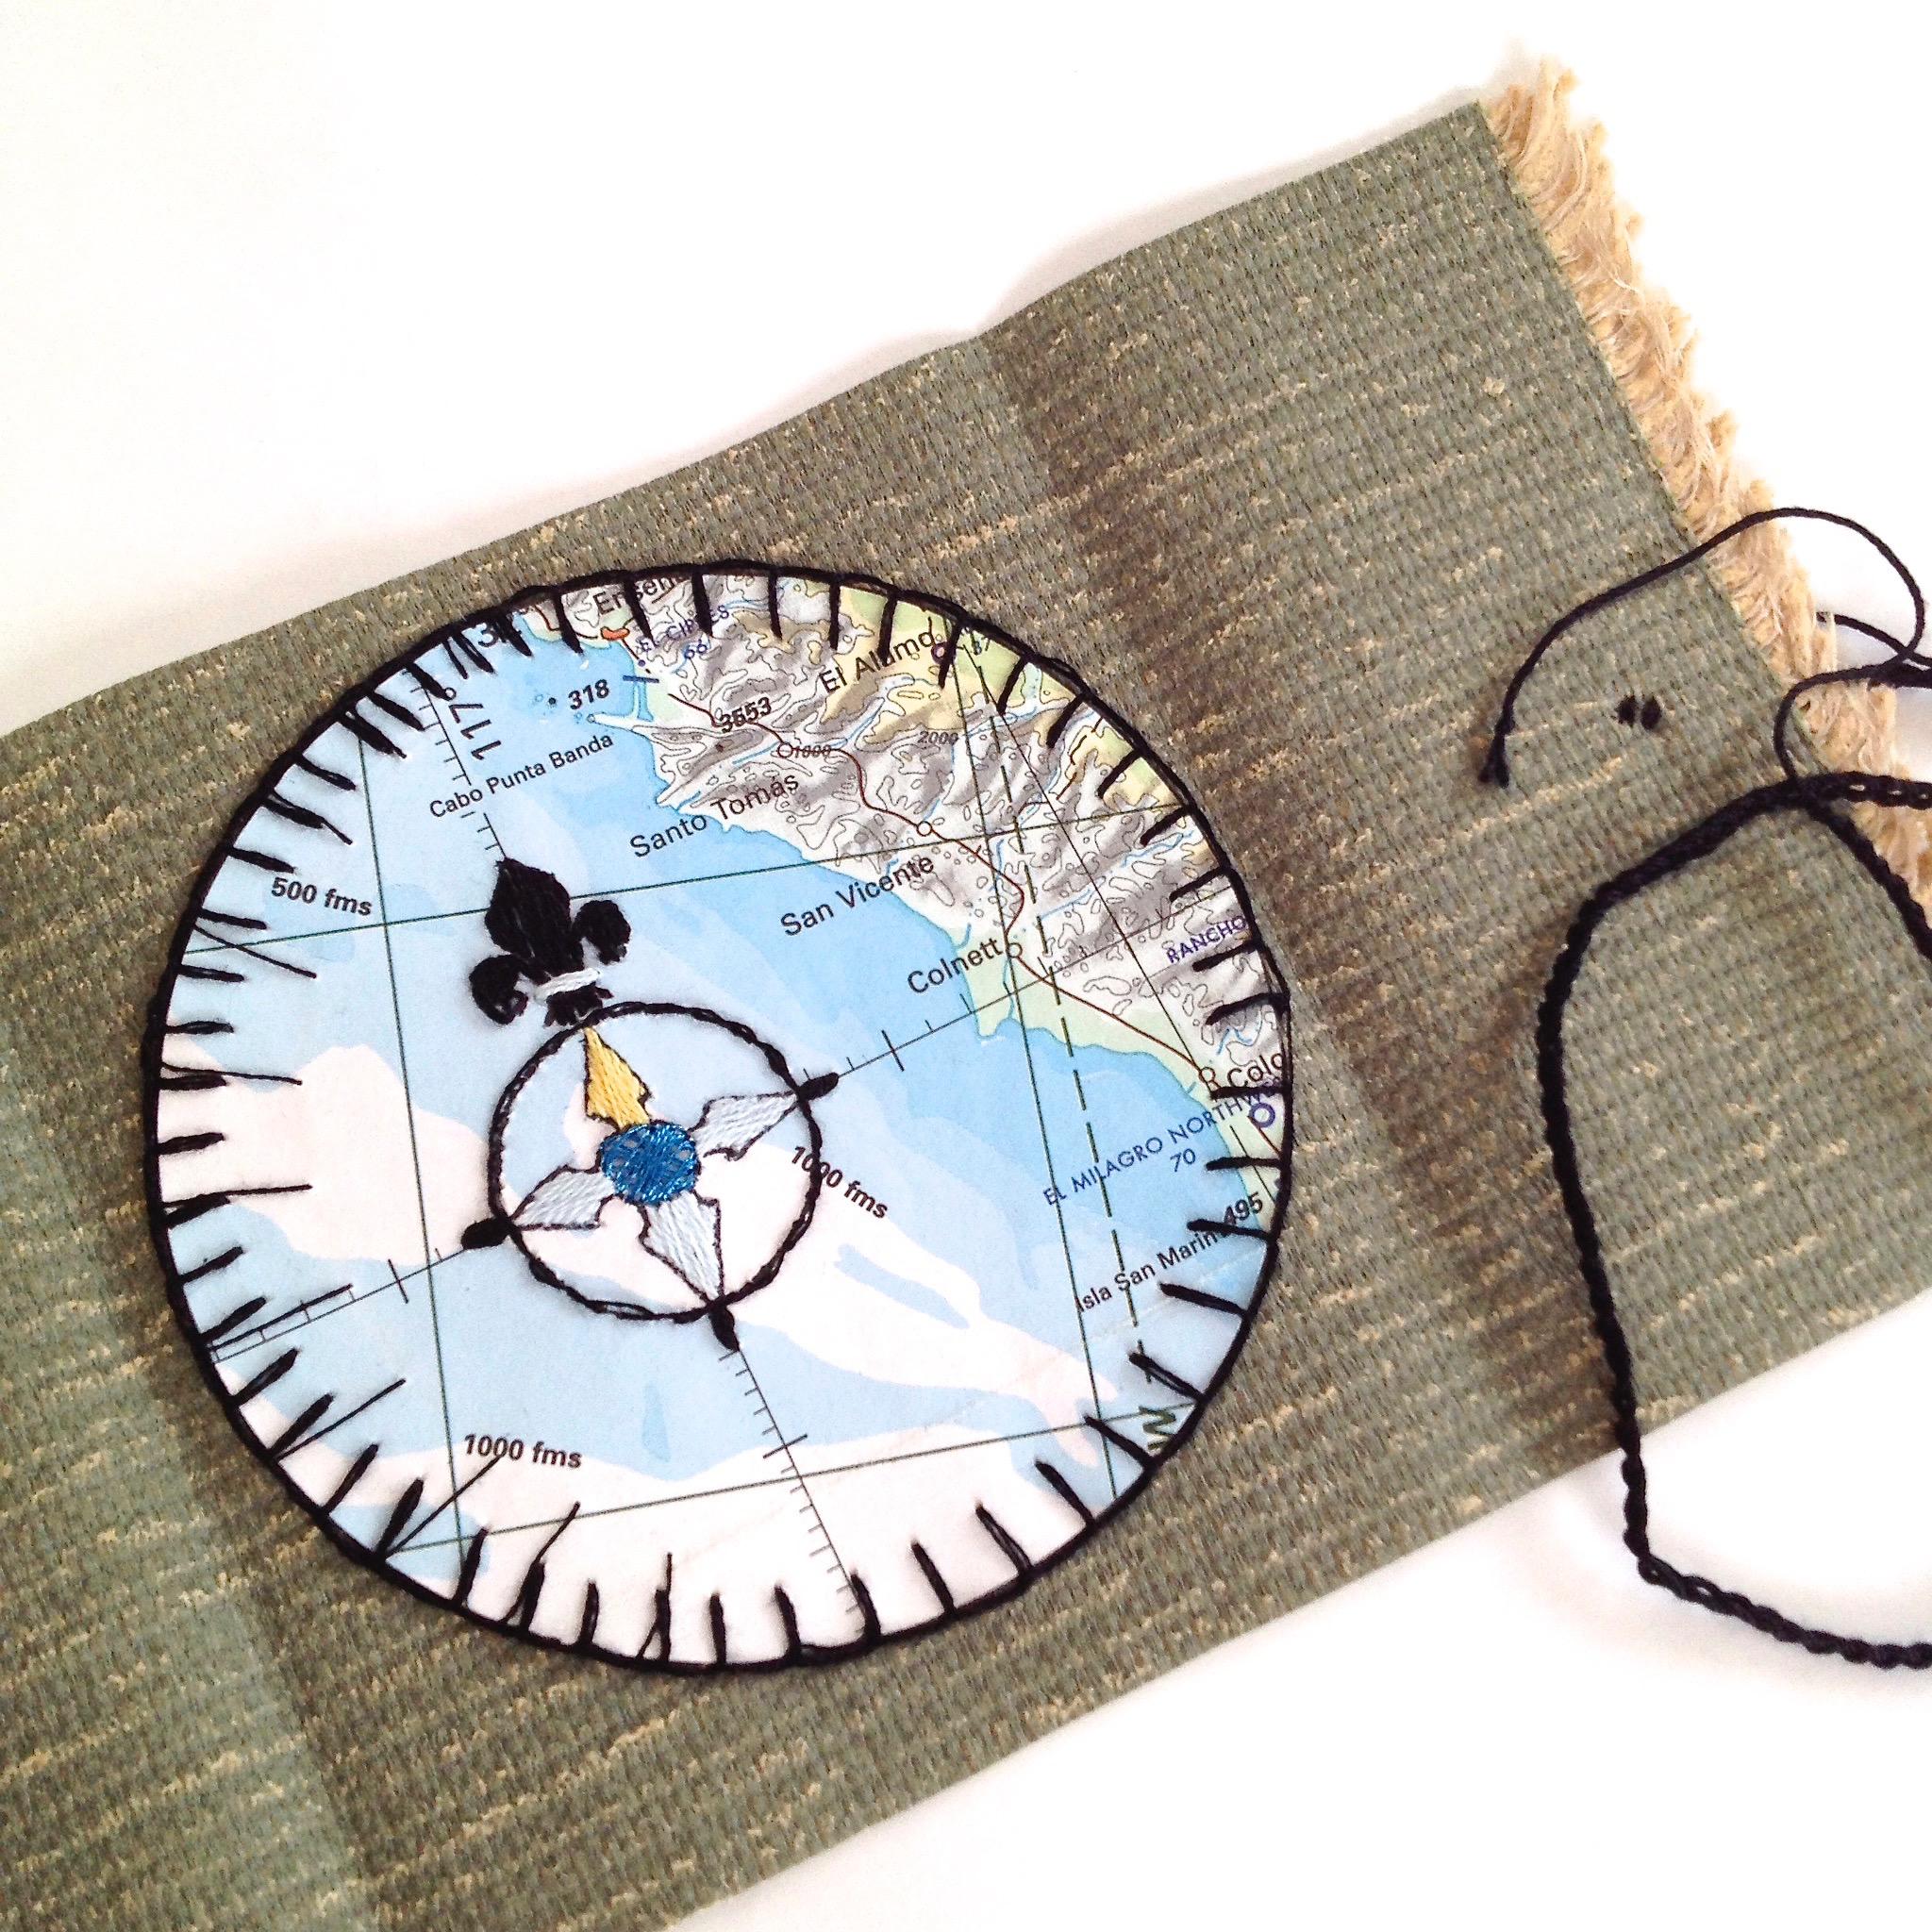 Navigation & Migration Series - Book Arts